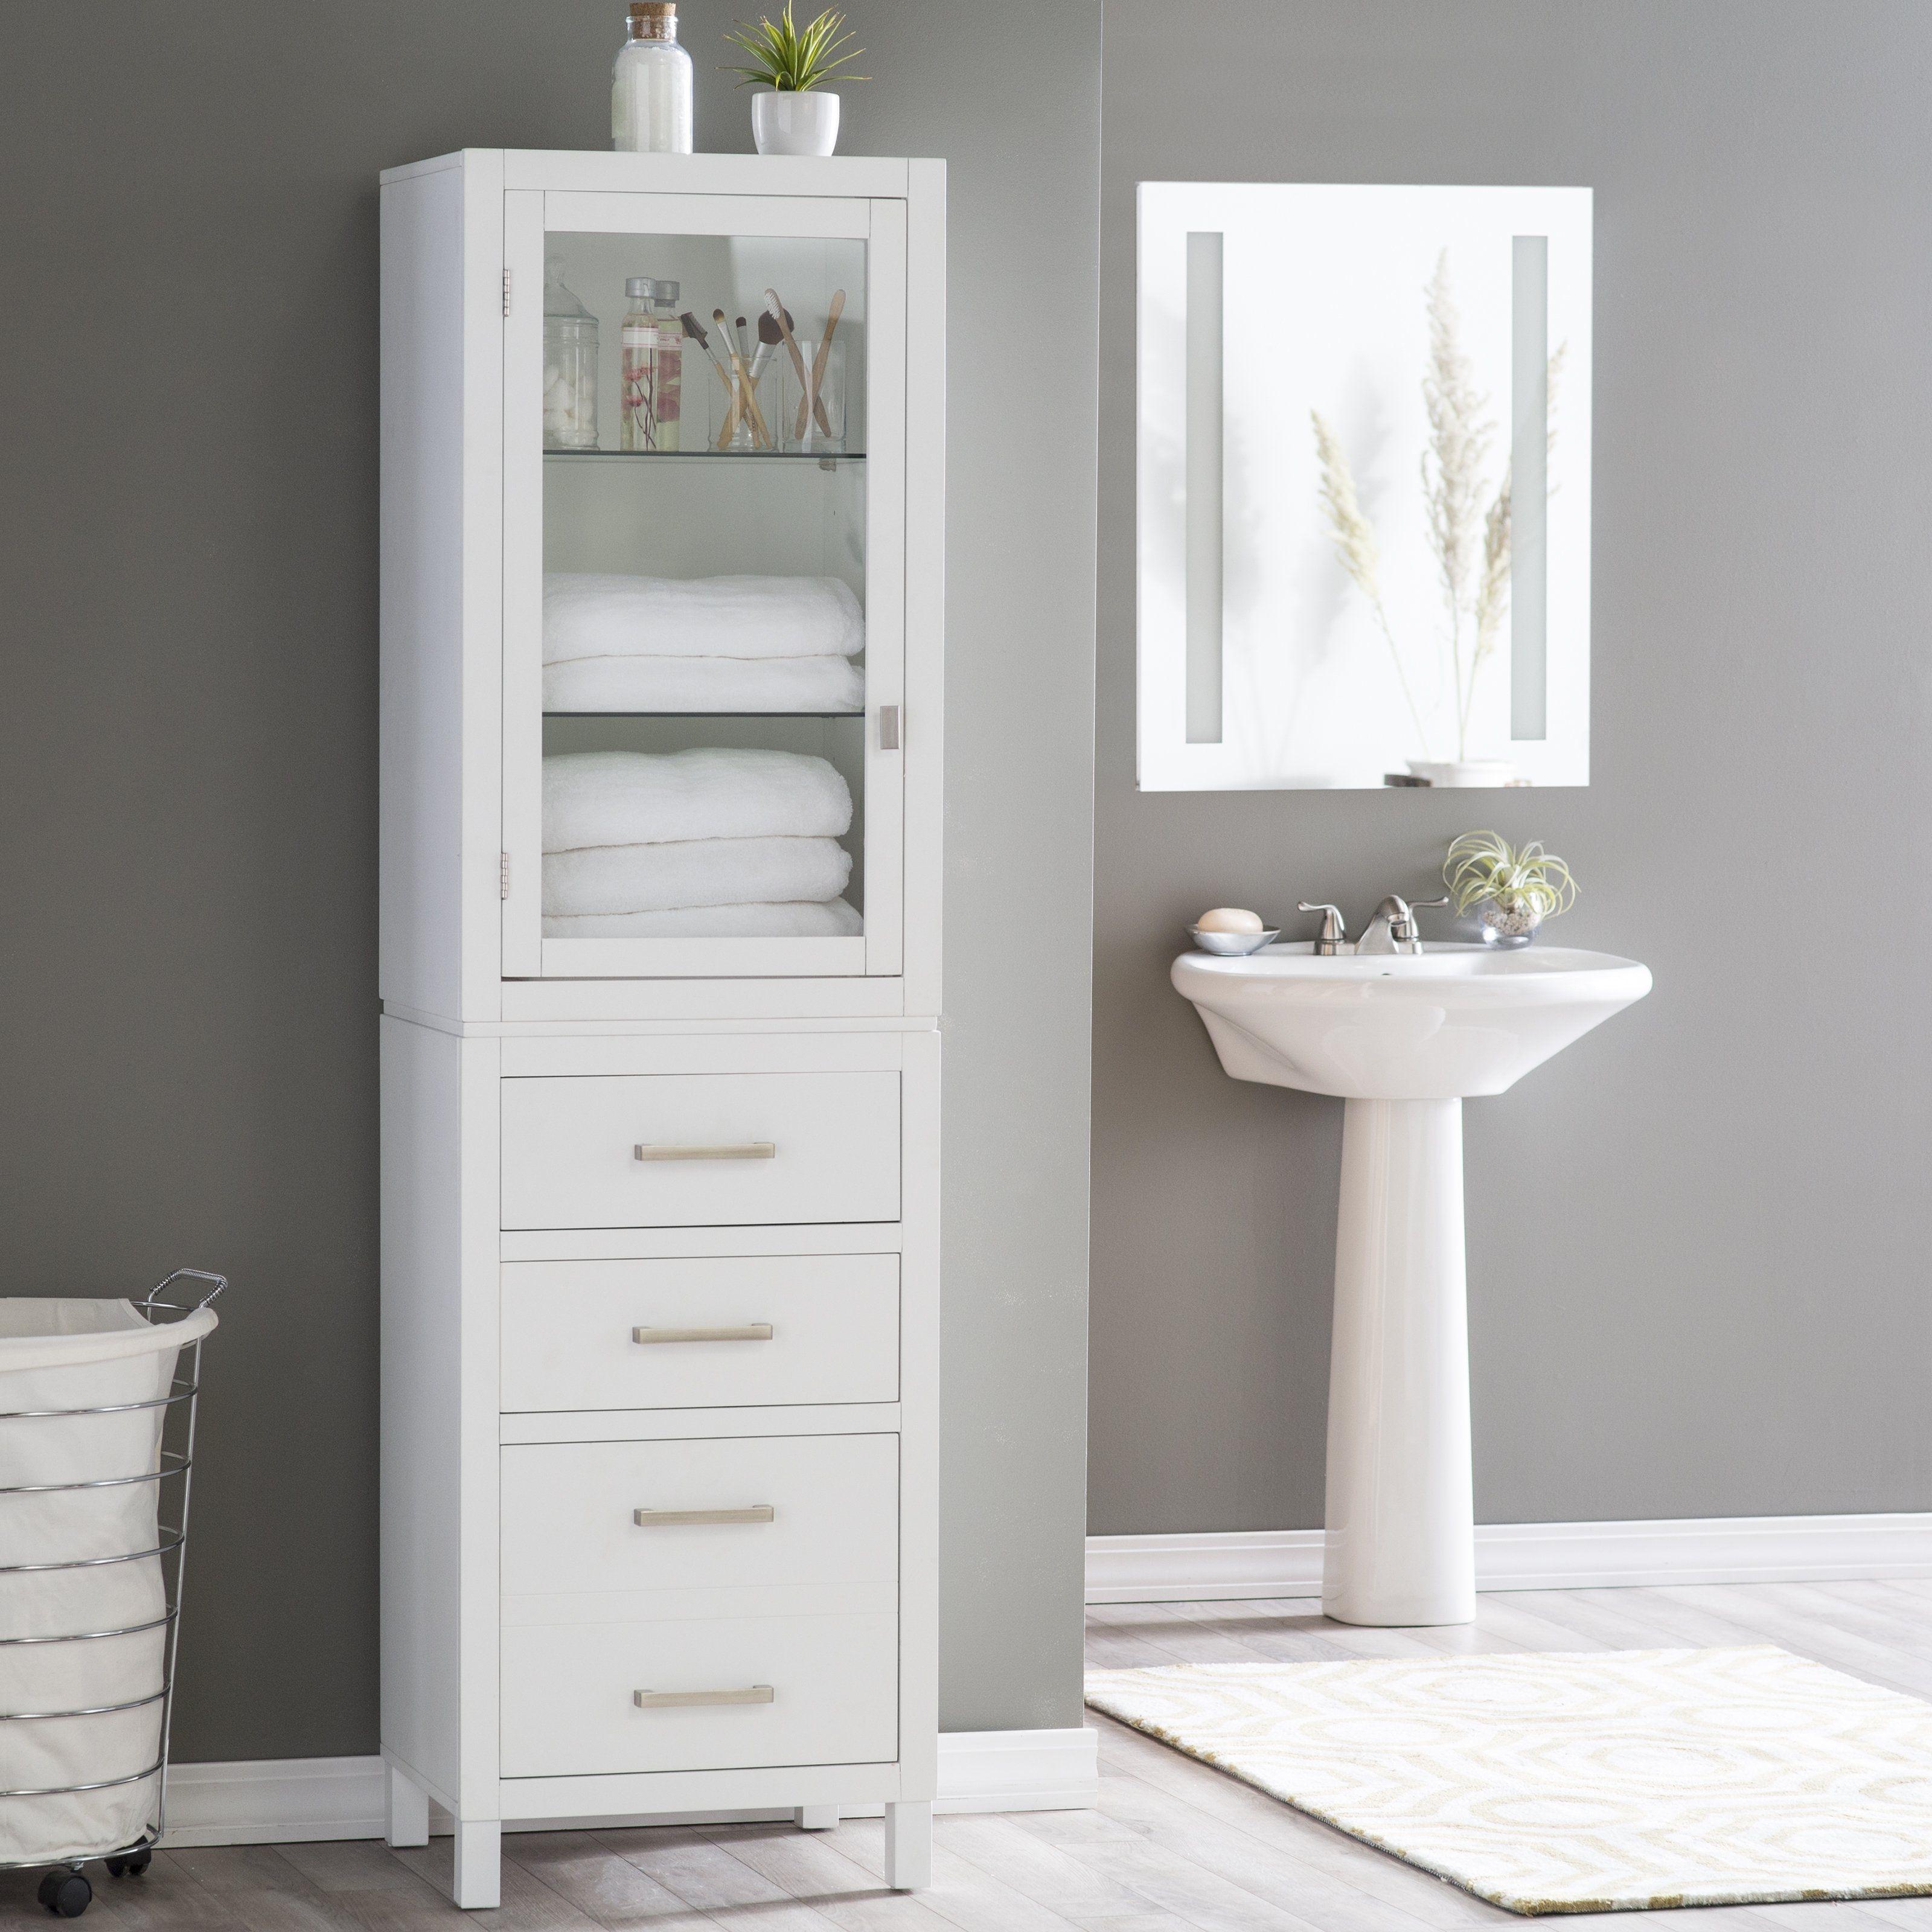 Bathroom storage ladder   ideas   Pinterest   Bathroom storage ...